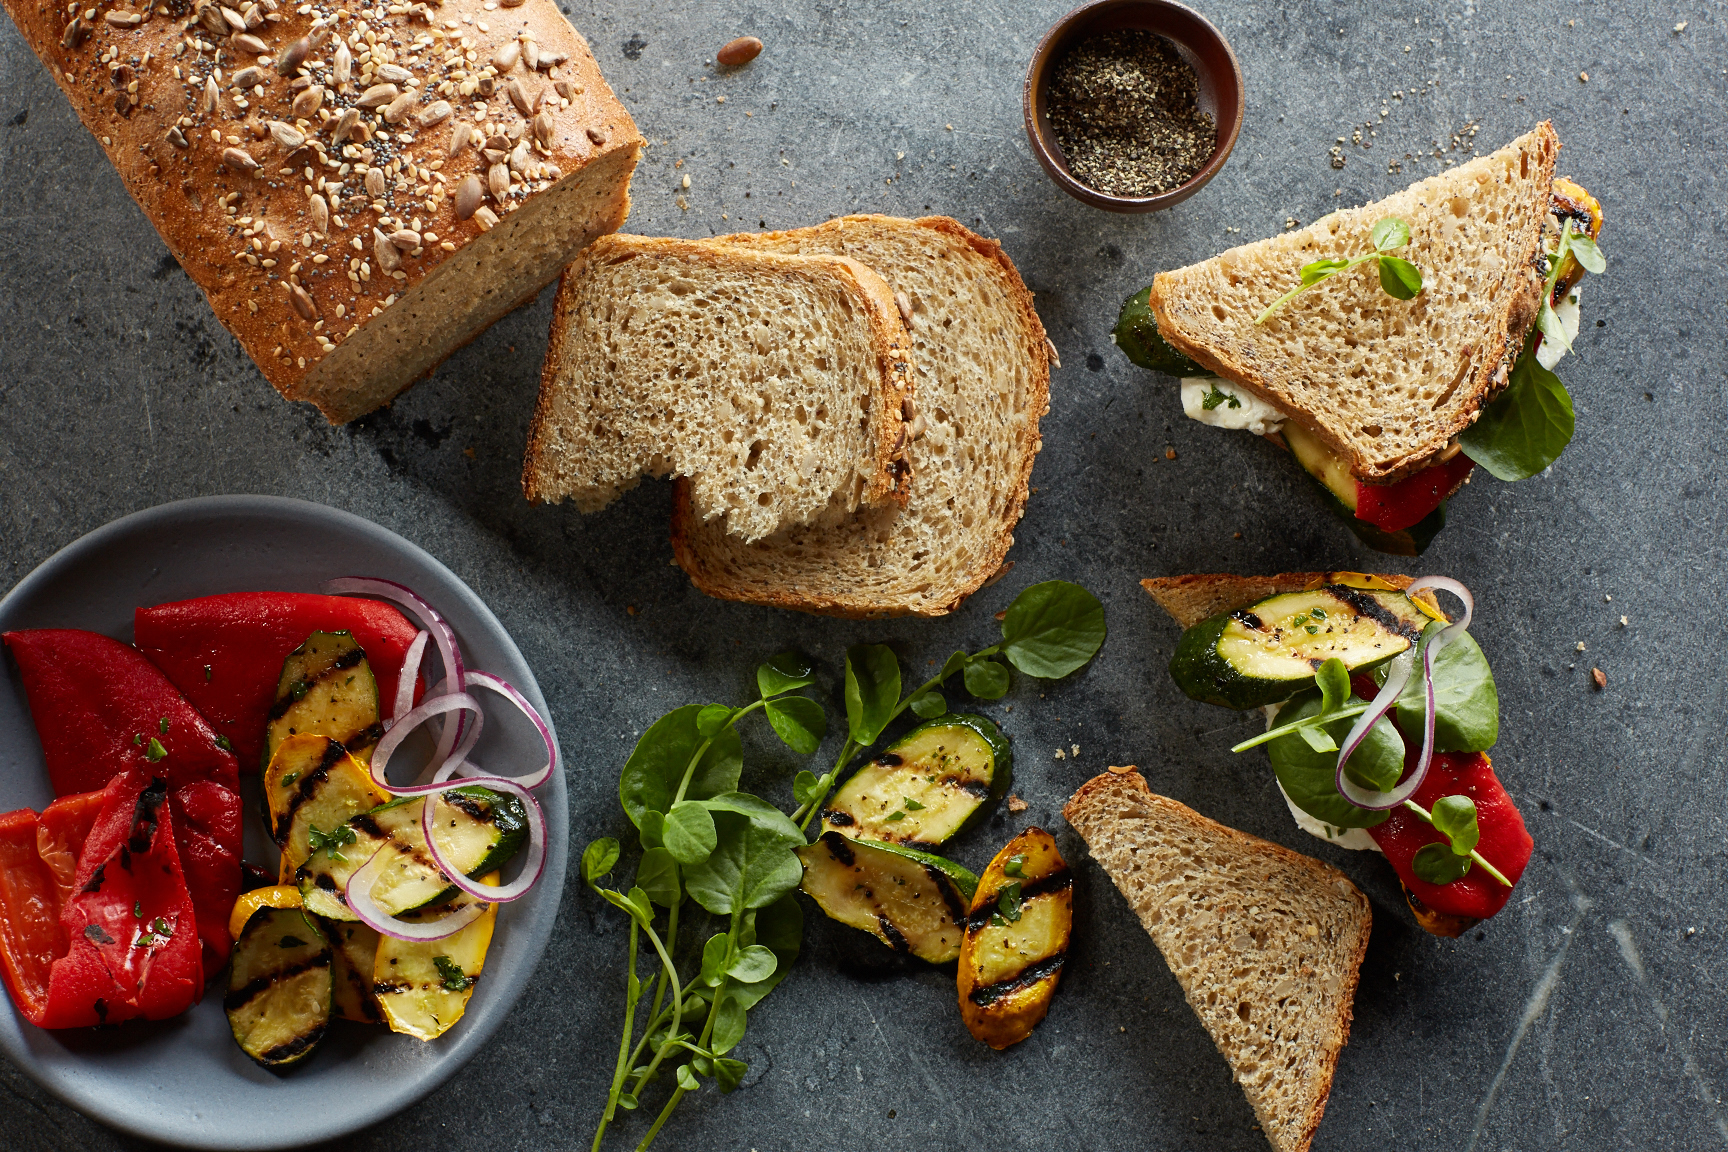 21_healthy_sandwich_23141.jpg